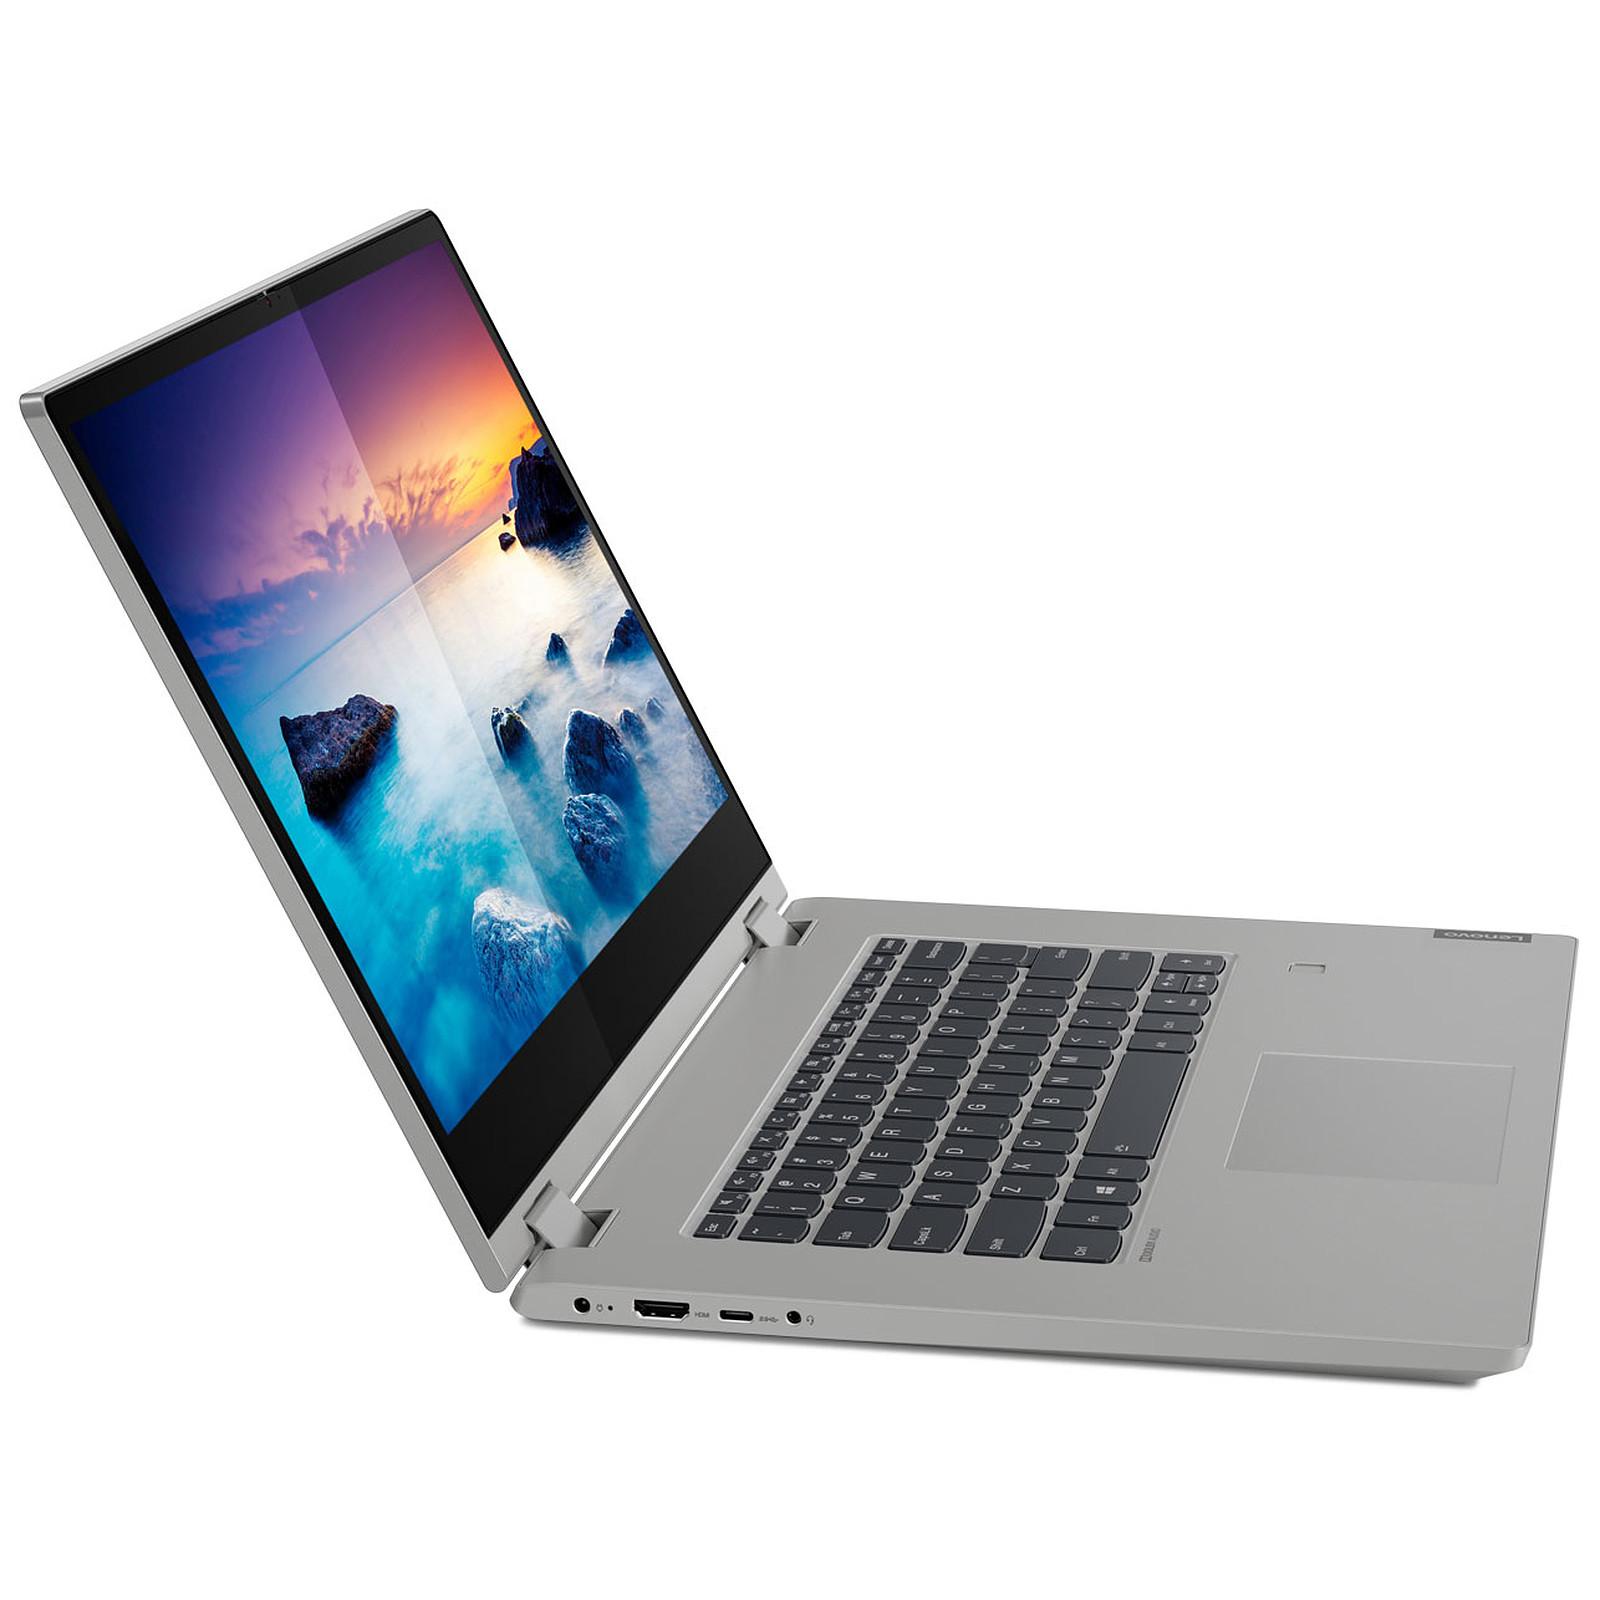 Lenovo IdeaPad C340-15IWL (81XJ004CFR)